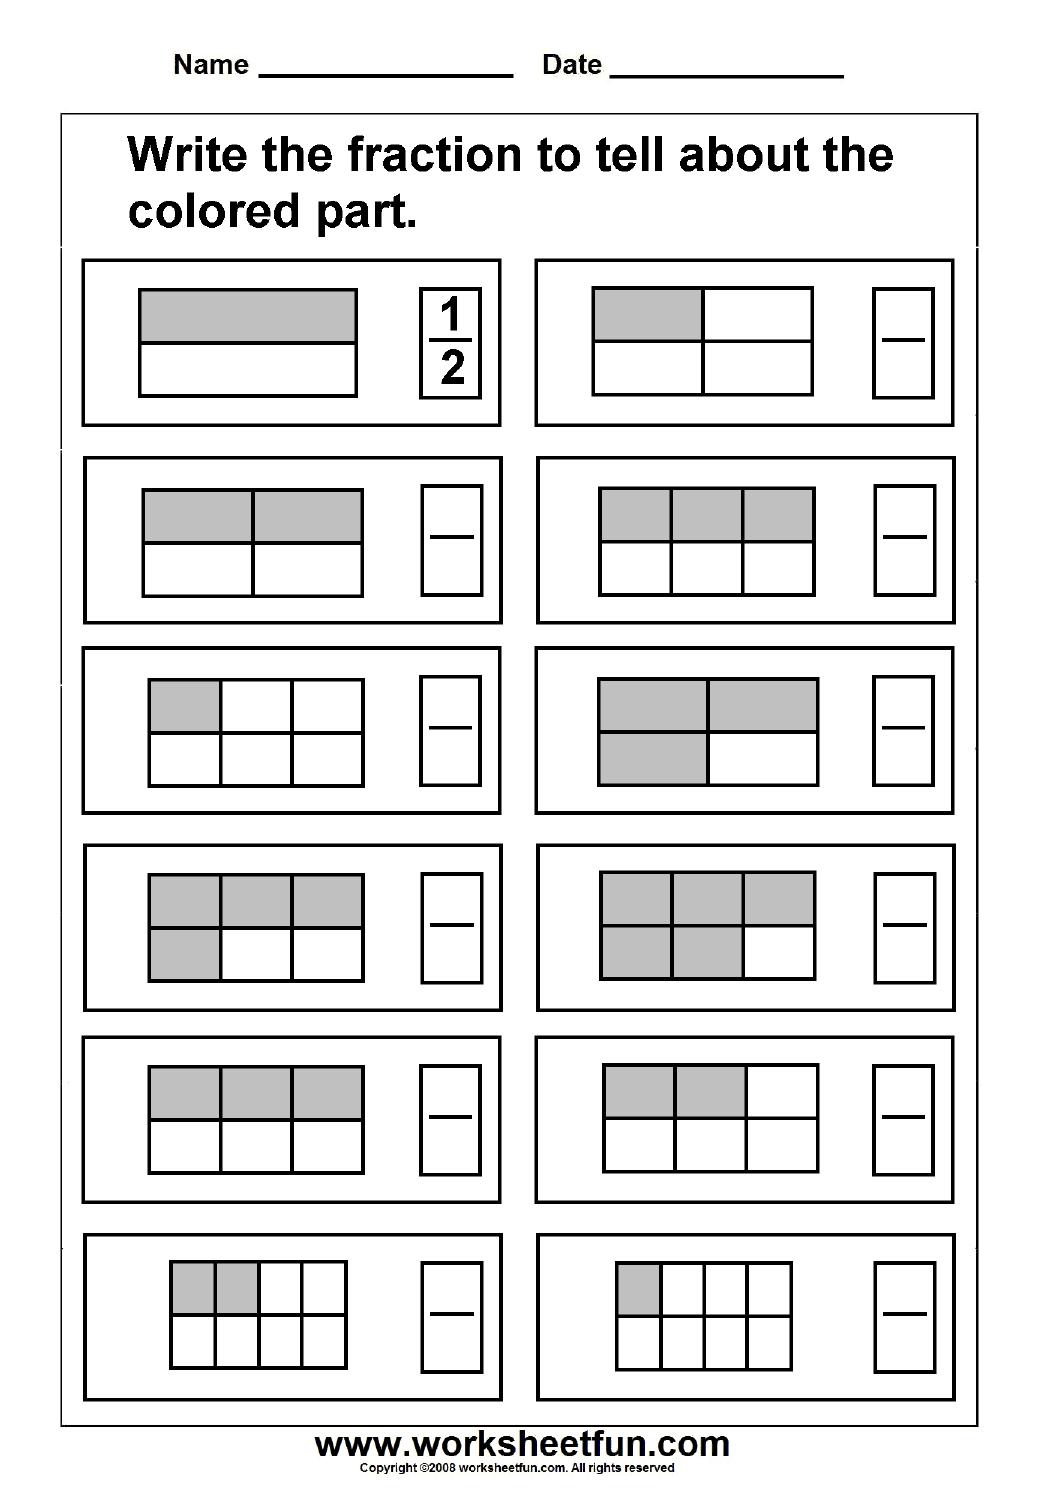 Free Printable Fraction Worksheet